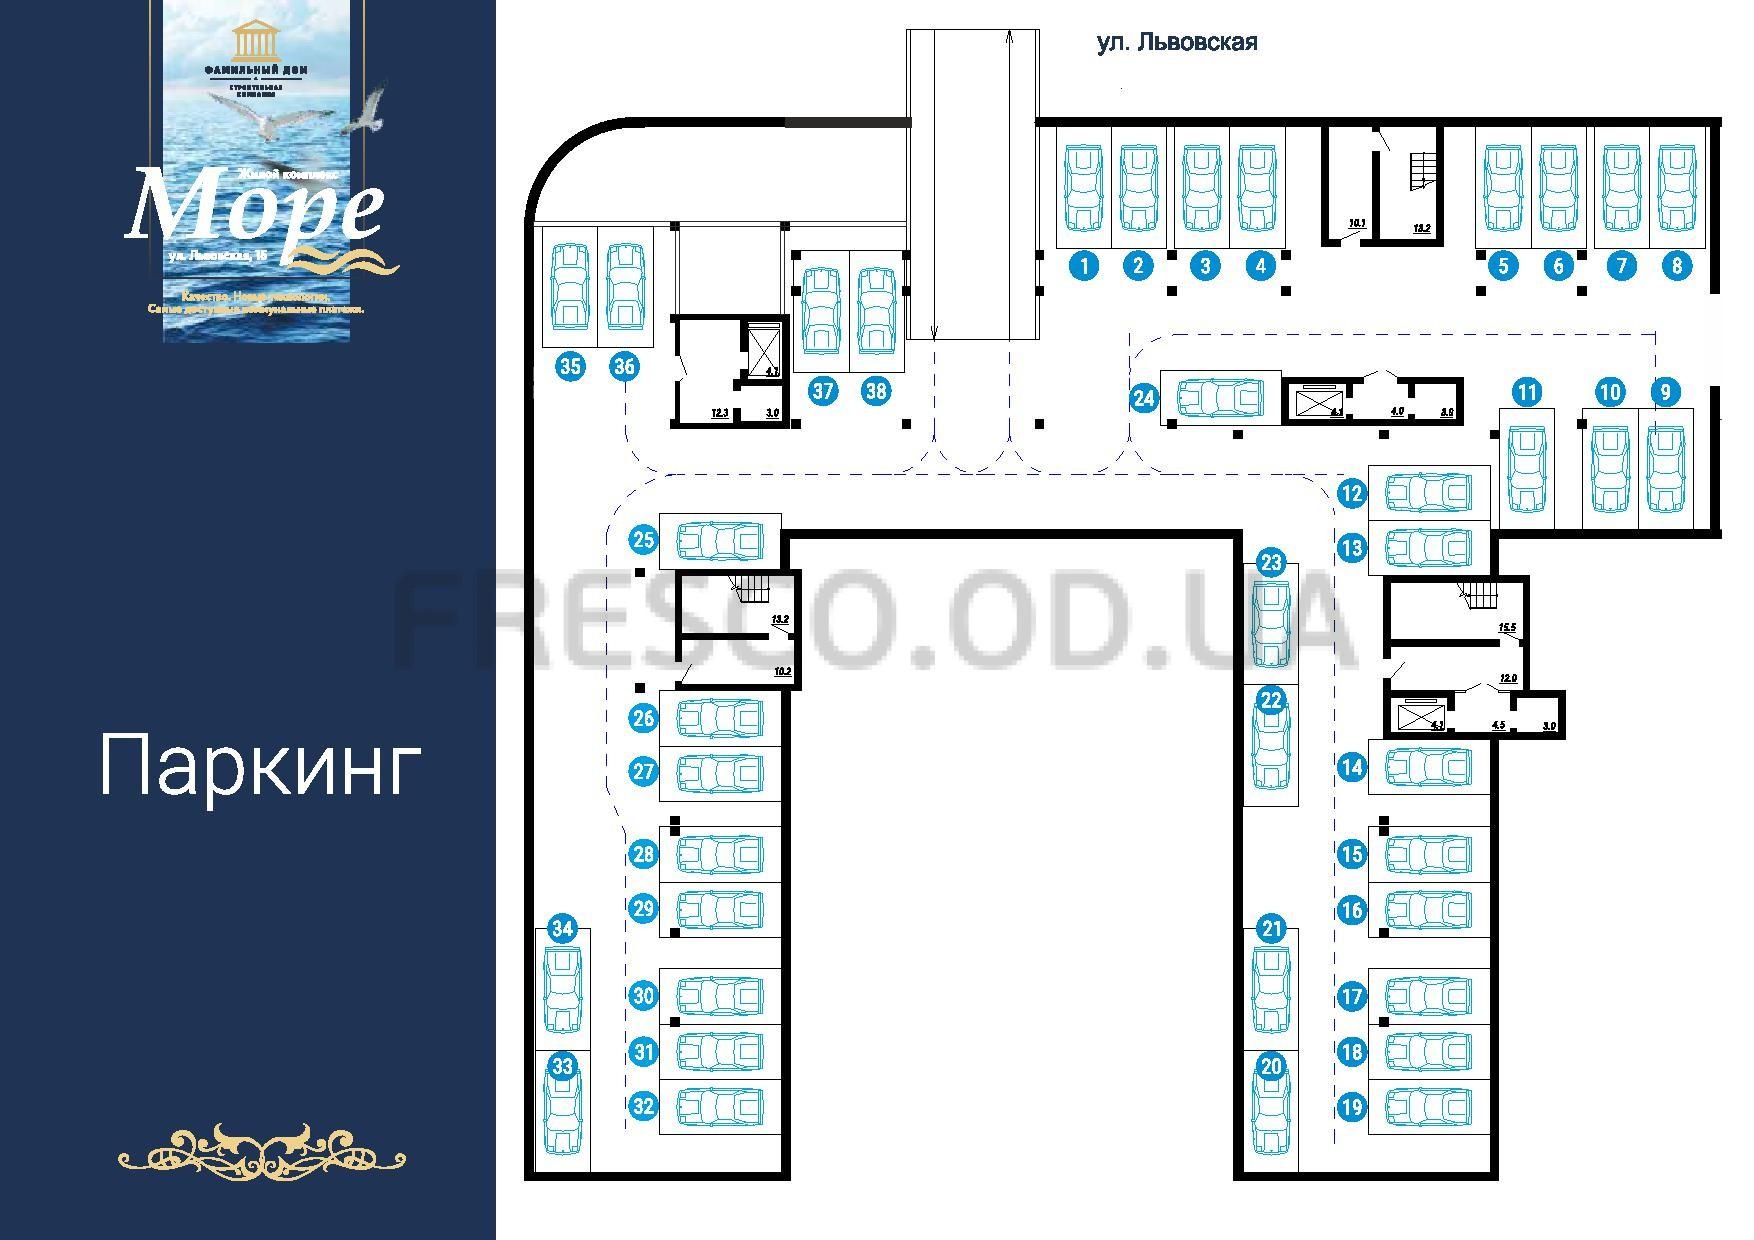 ЖК Море секции 1,3,4 план паркинга